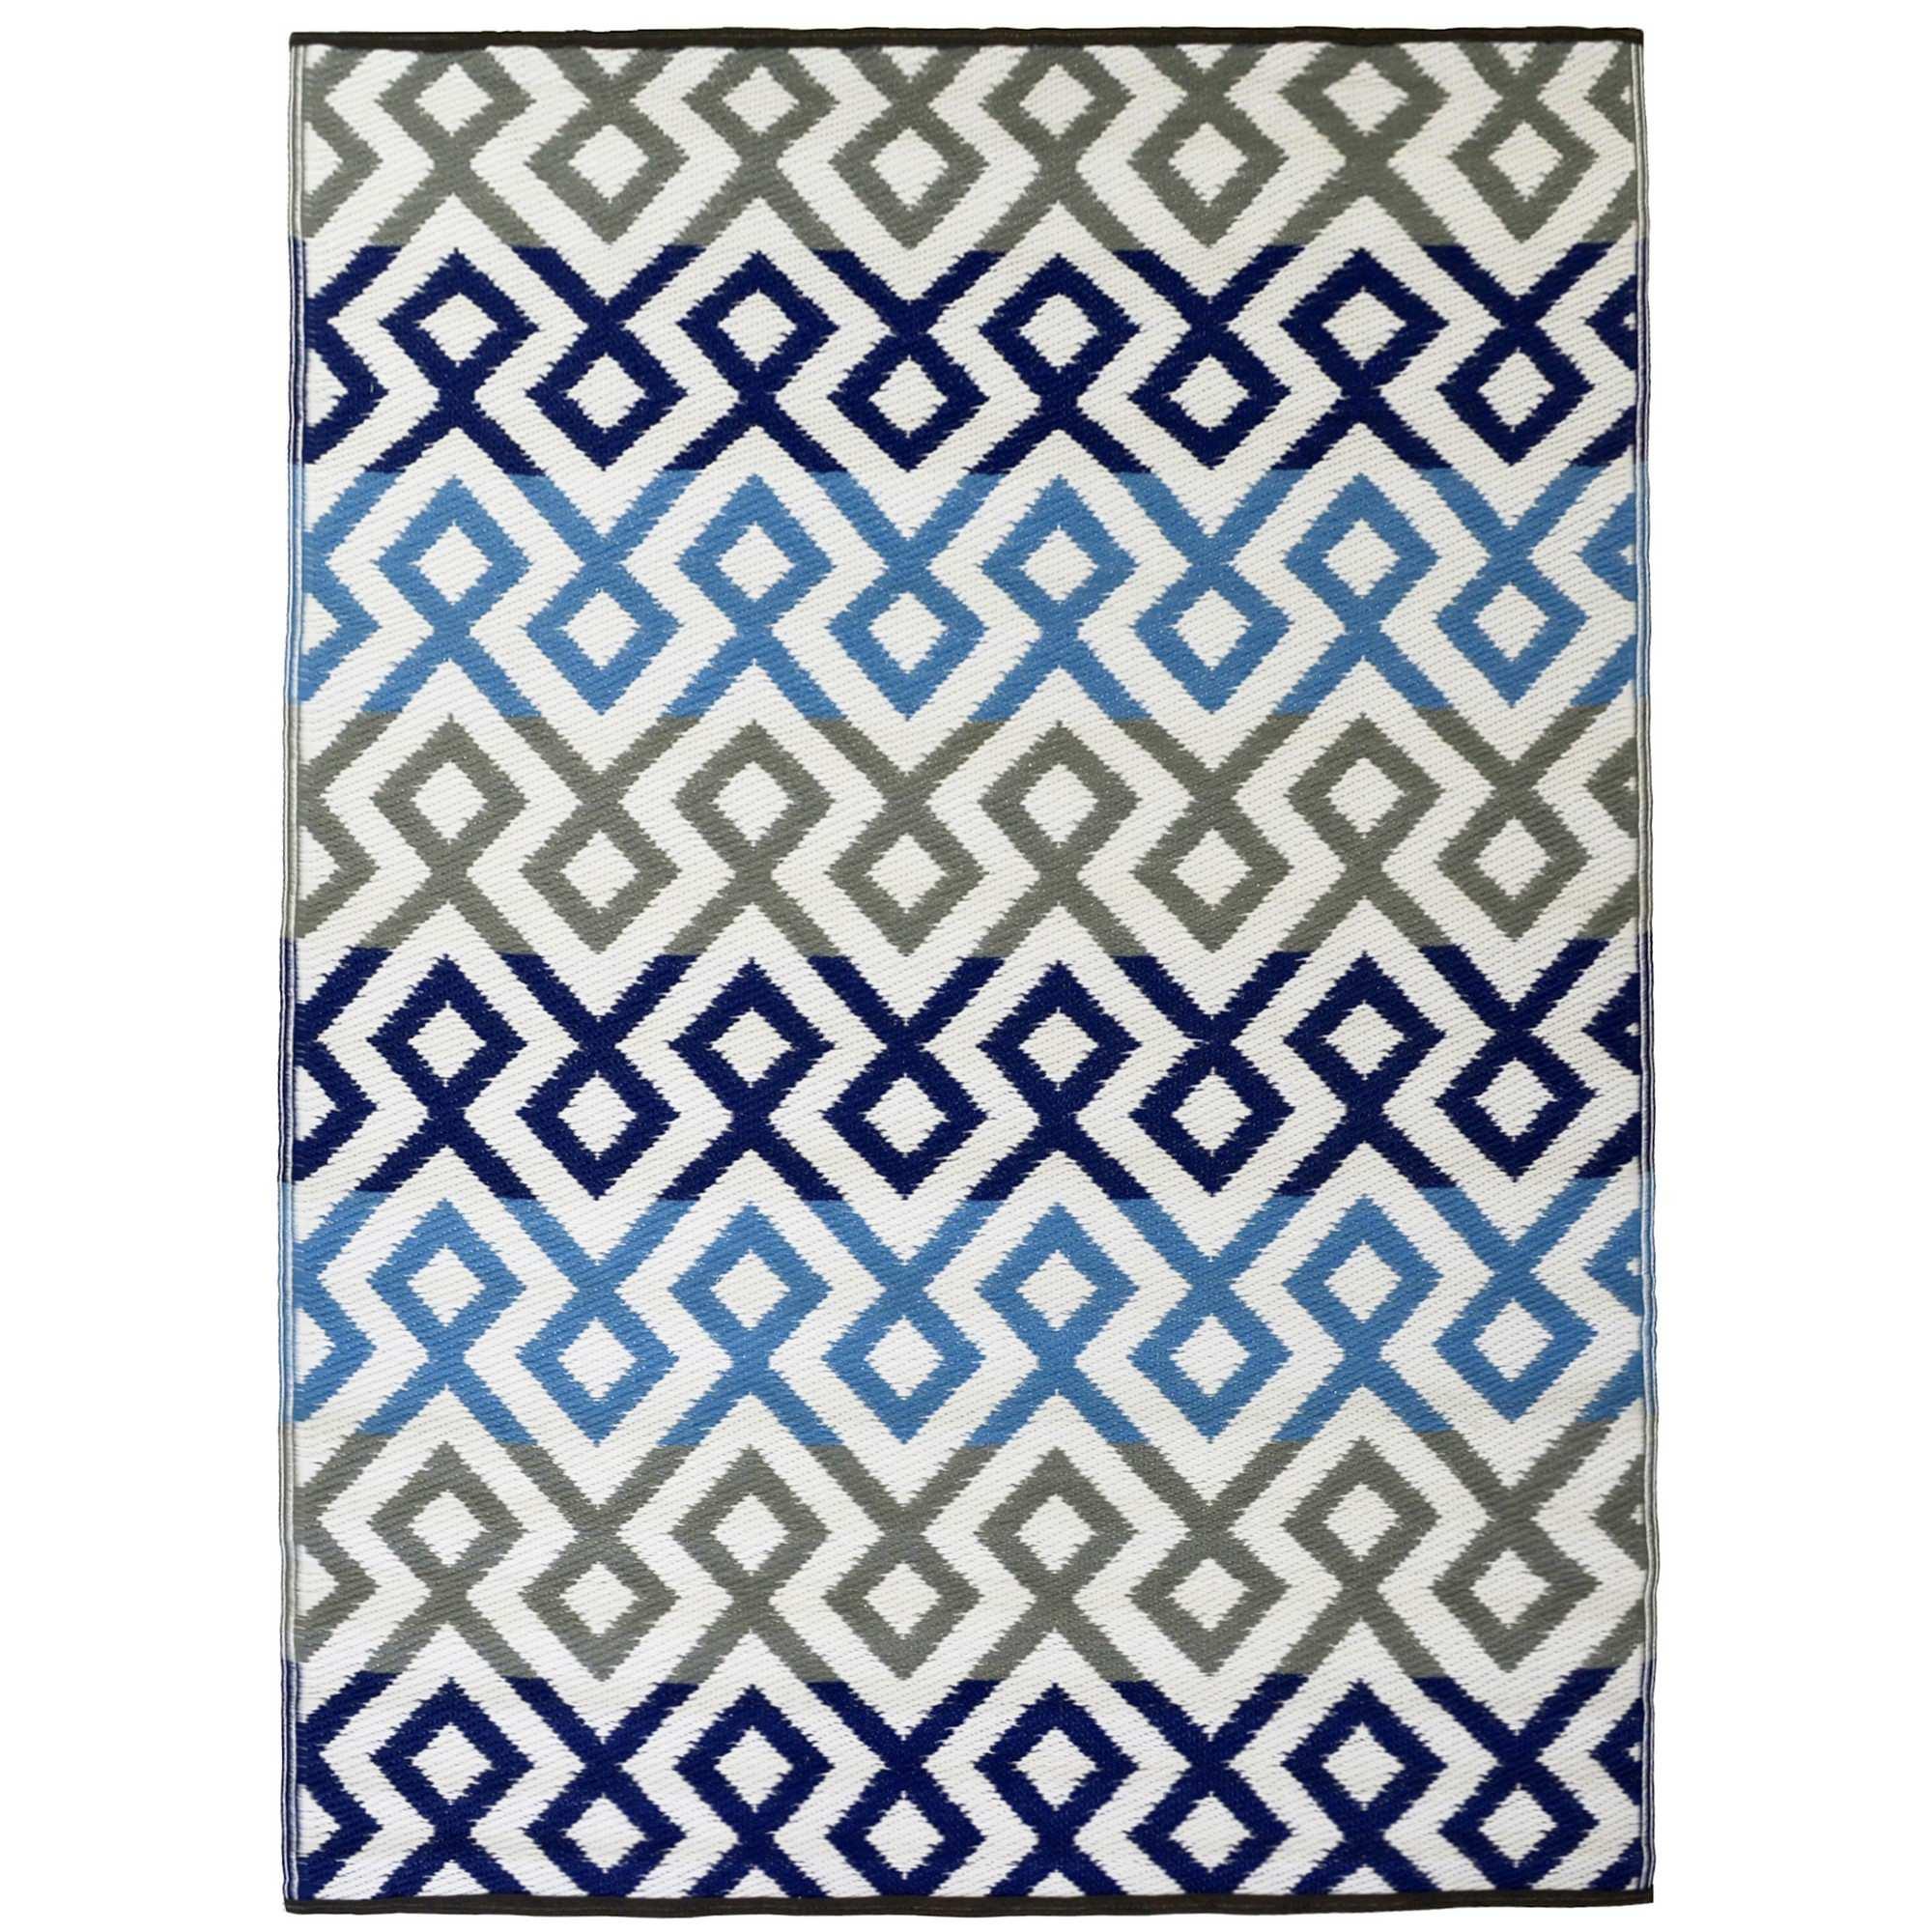 Chatai Geo Diamond Reversible Indoor/Outdoor Rug, 150x240cm, Blue/Grey